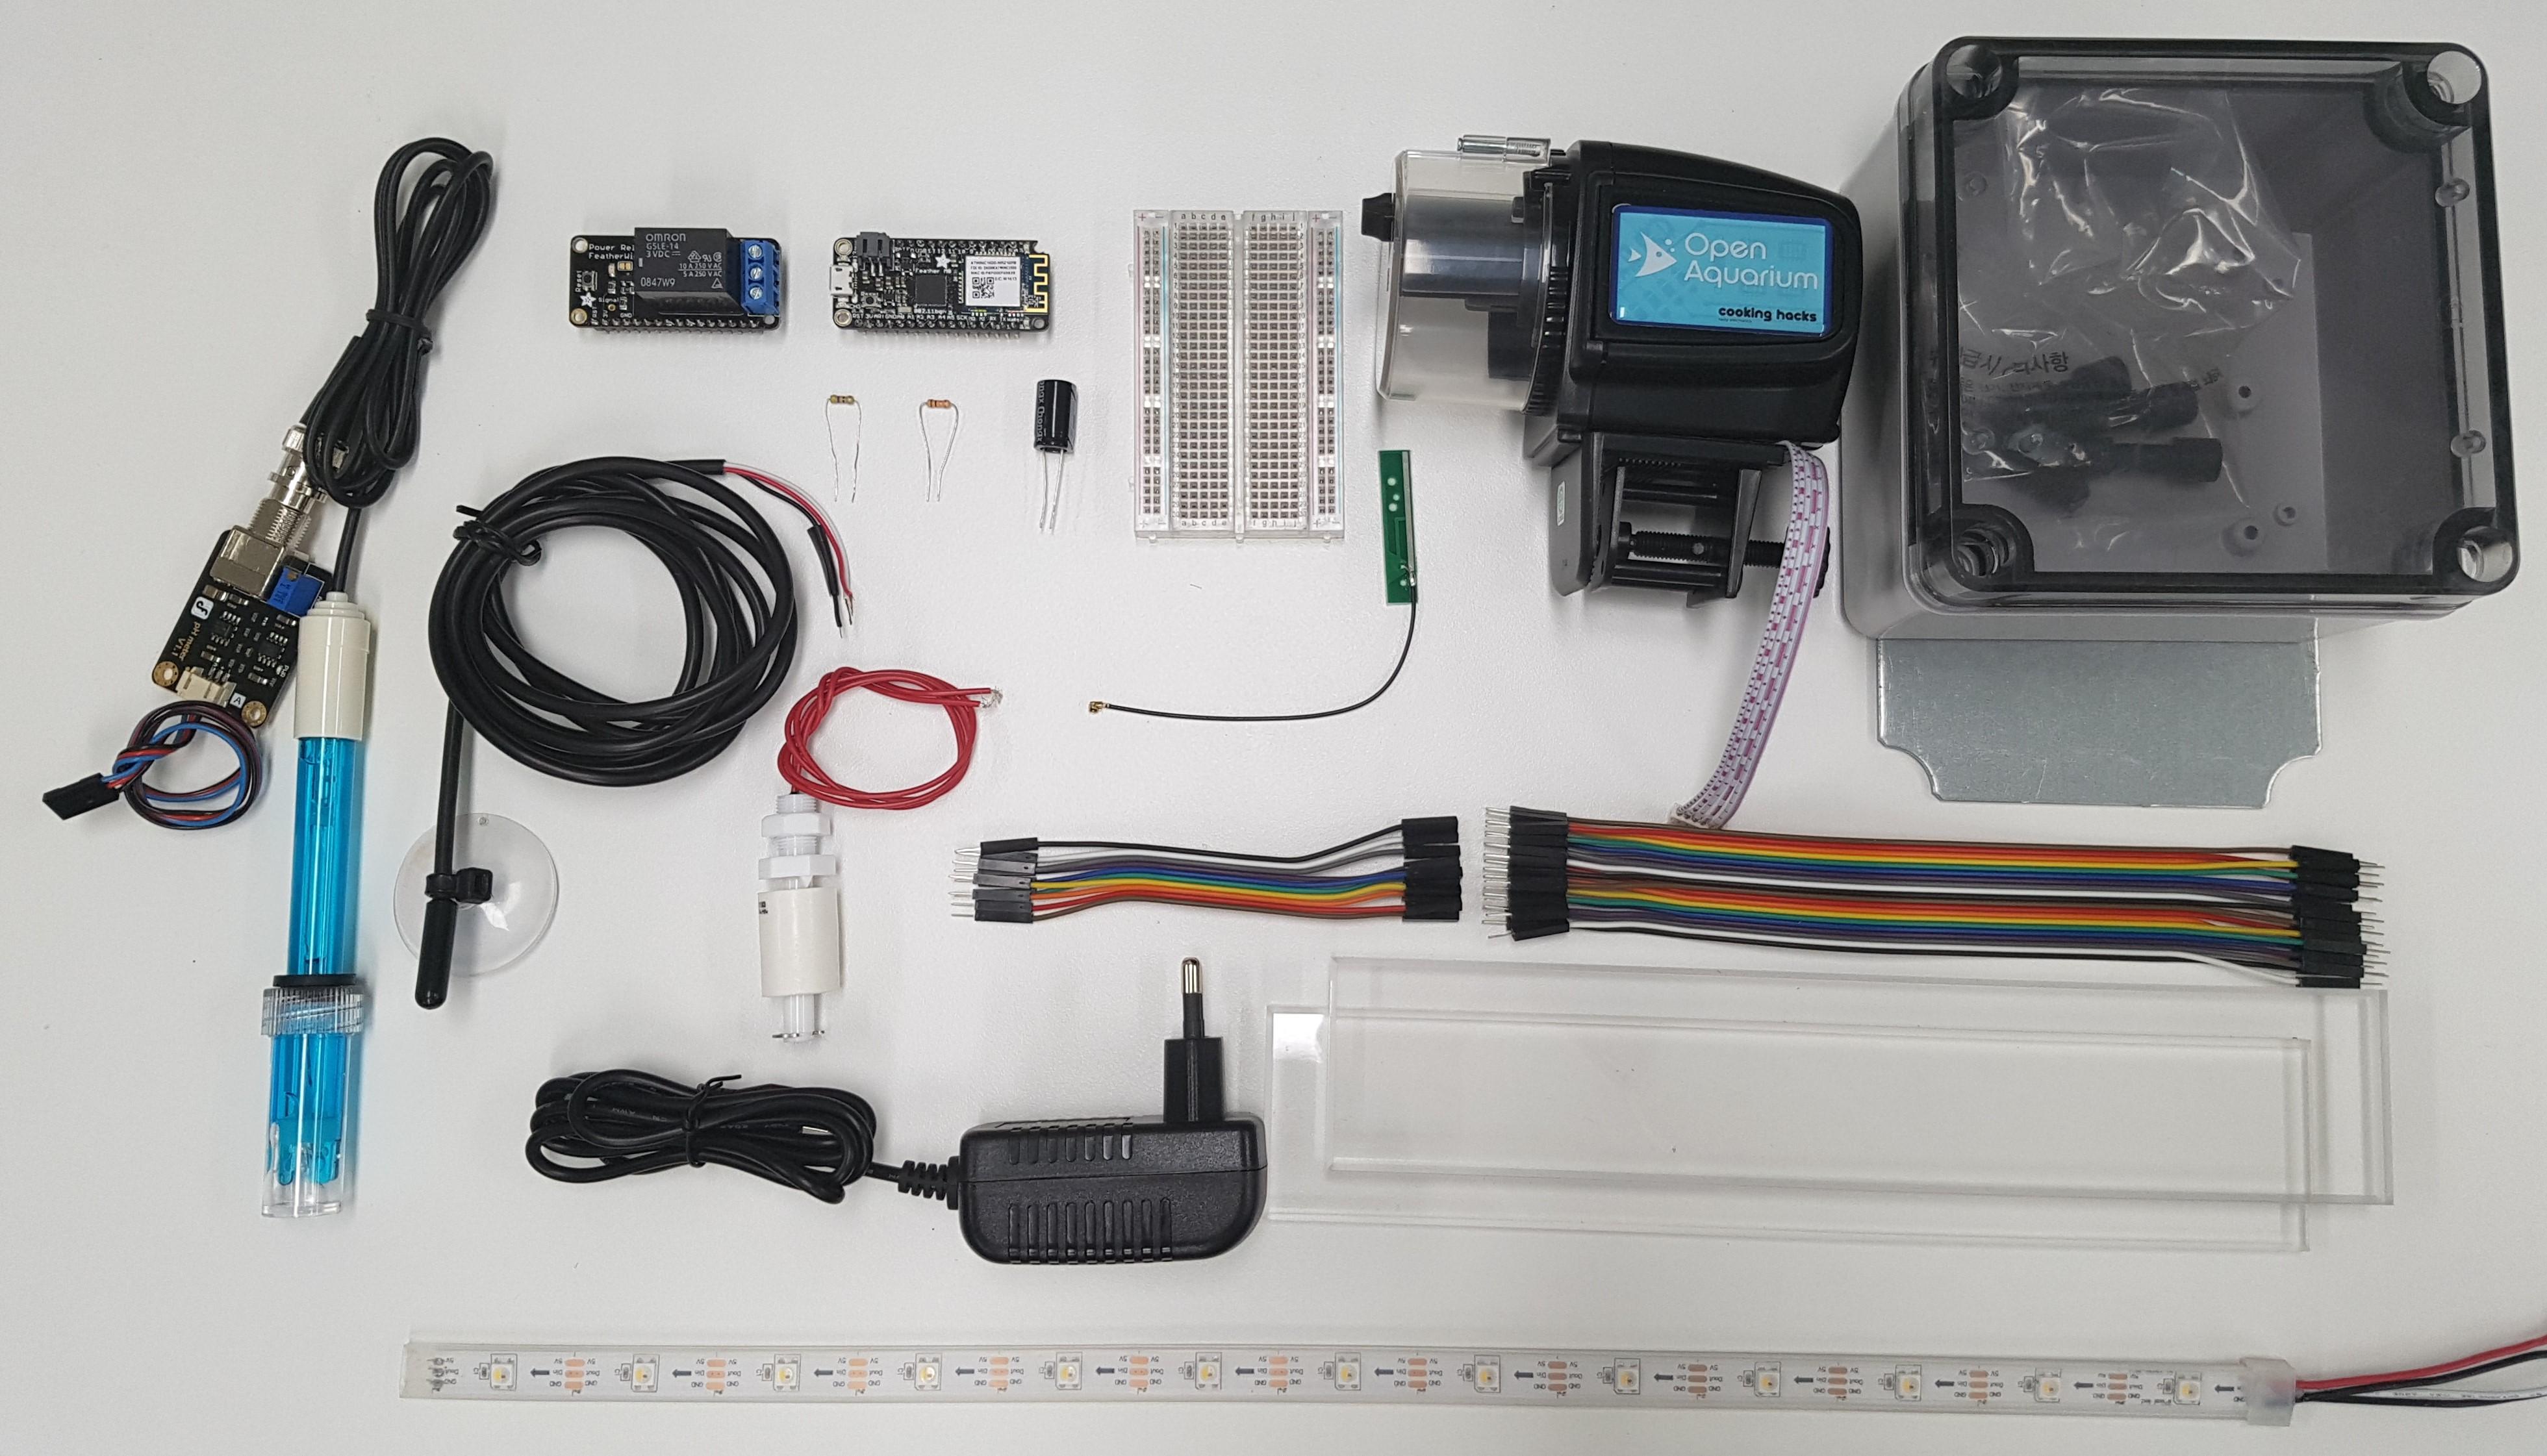 nCube:Thyme for Arduino Application : nCube Aqua (English) · IoTKETI